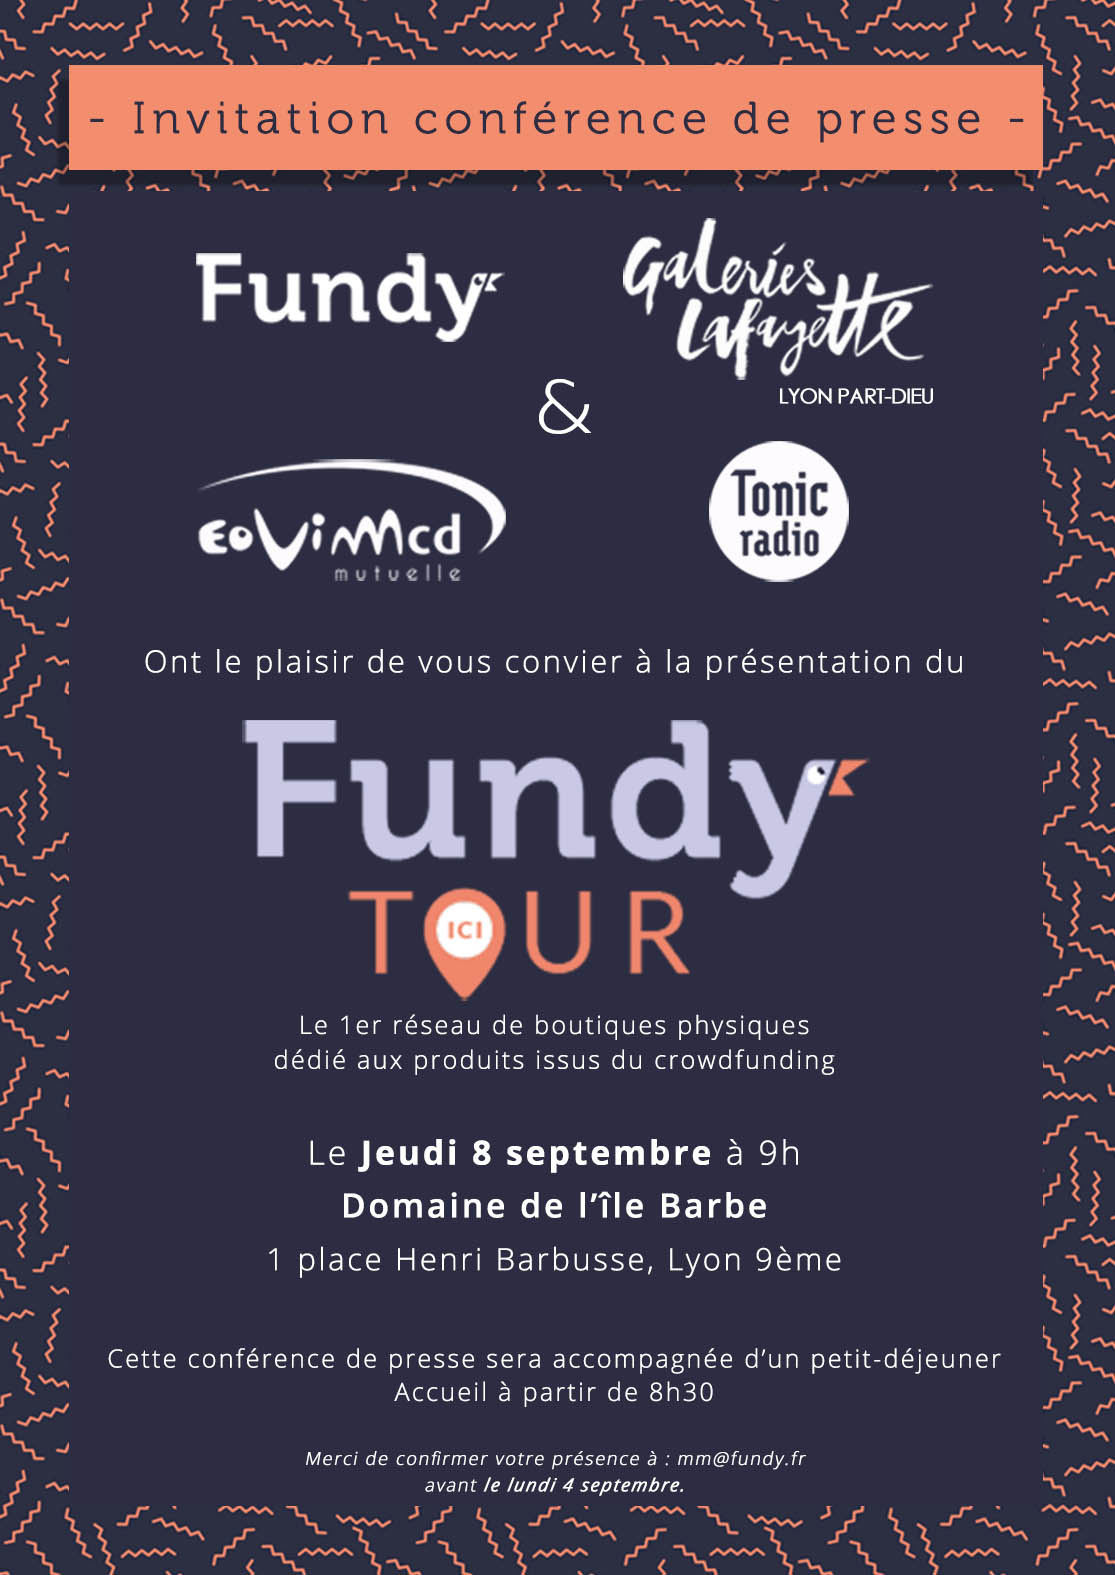 Invitation conférence de presse Fundy